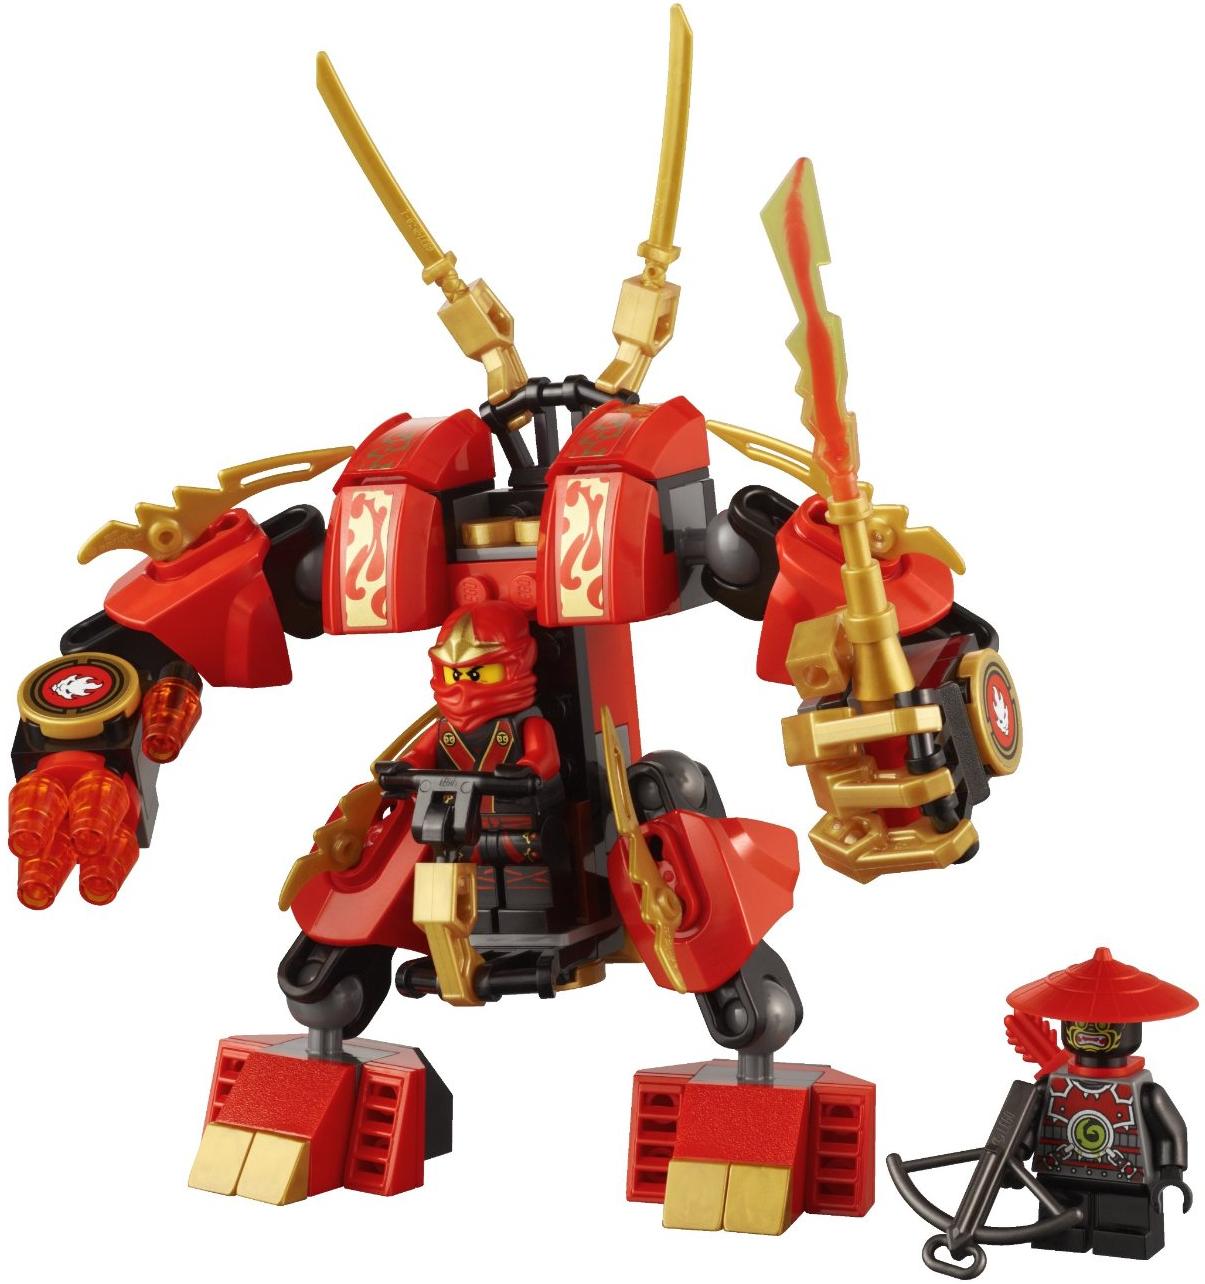 NEW Lego Ninjago 4 Minifig ELEMENTAL BLADES Ninja Minifigure Sword Weapons 70505